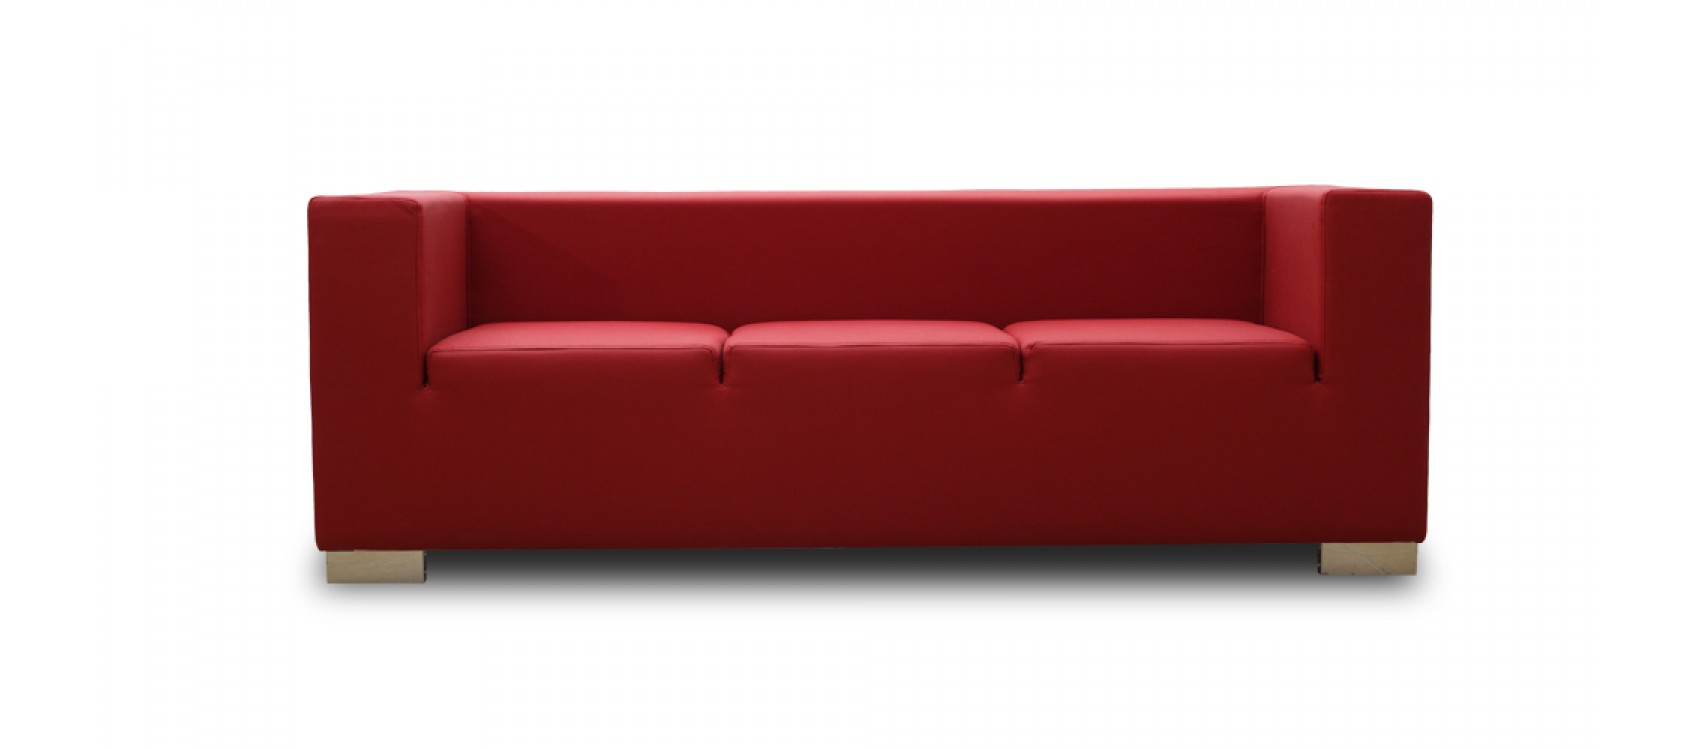 Sofa PYRAMID foto 1